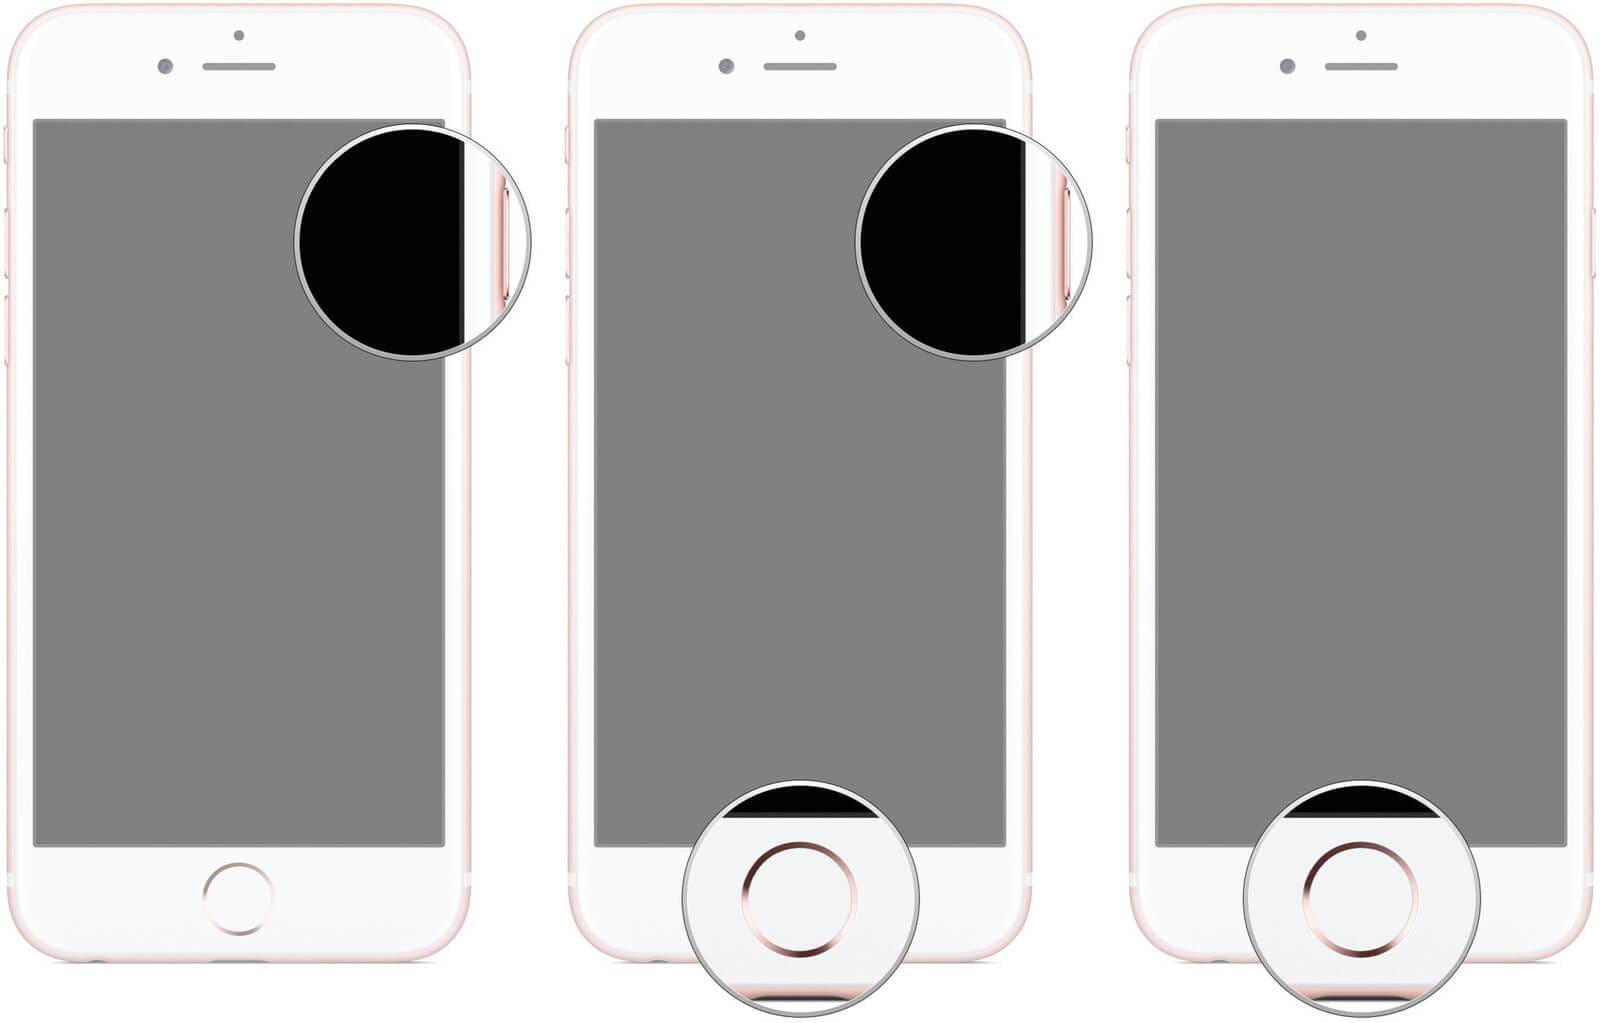 enter iPhone 6 into DFU mode